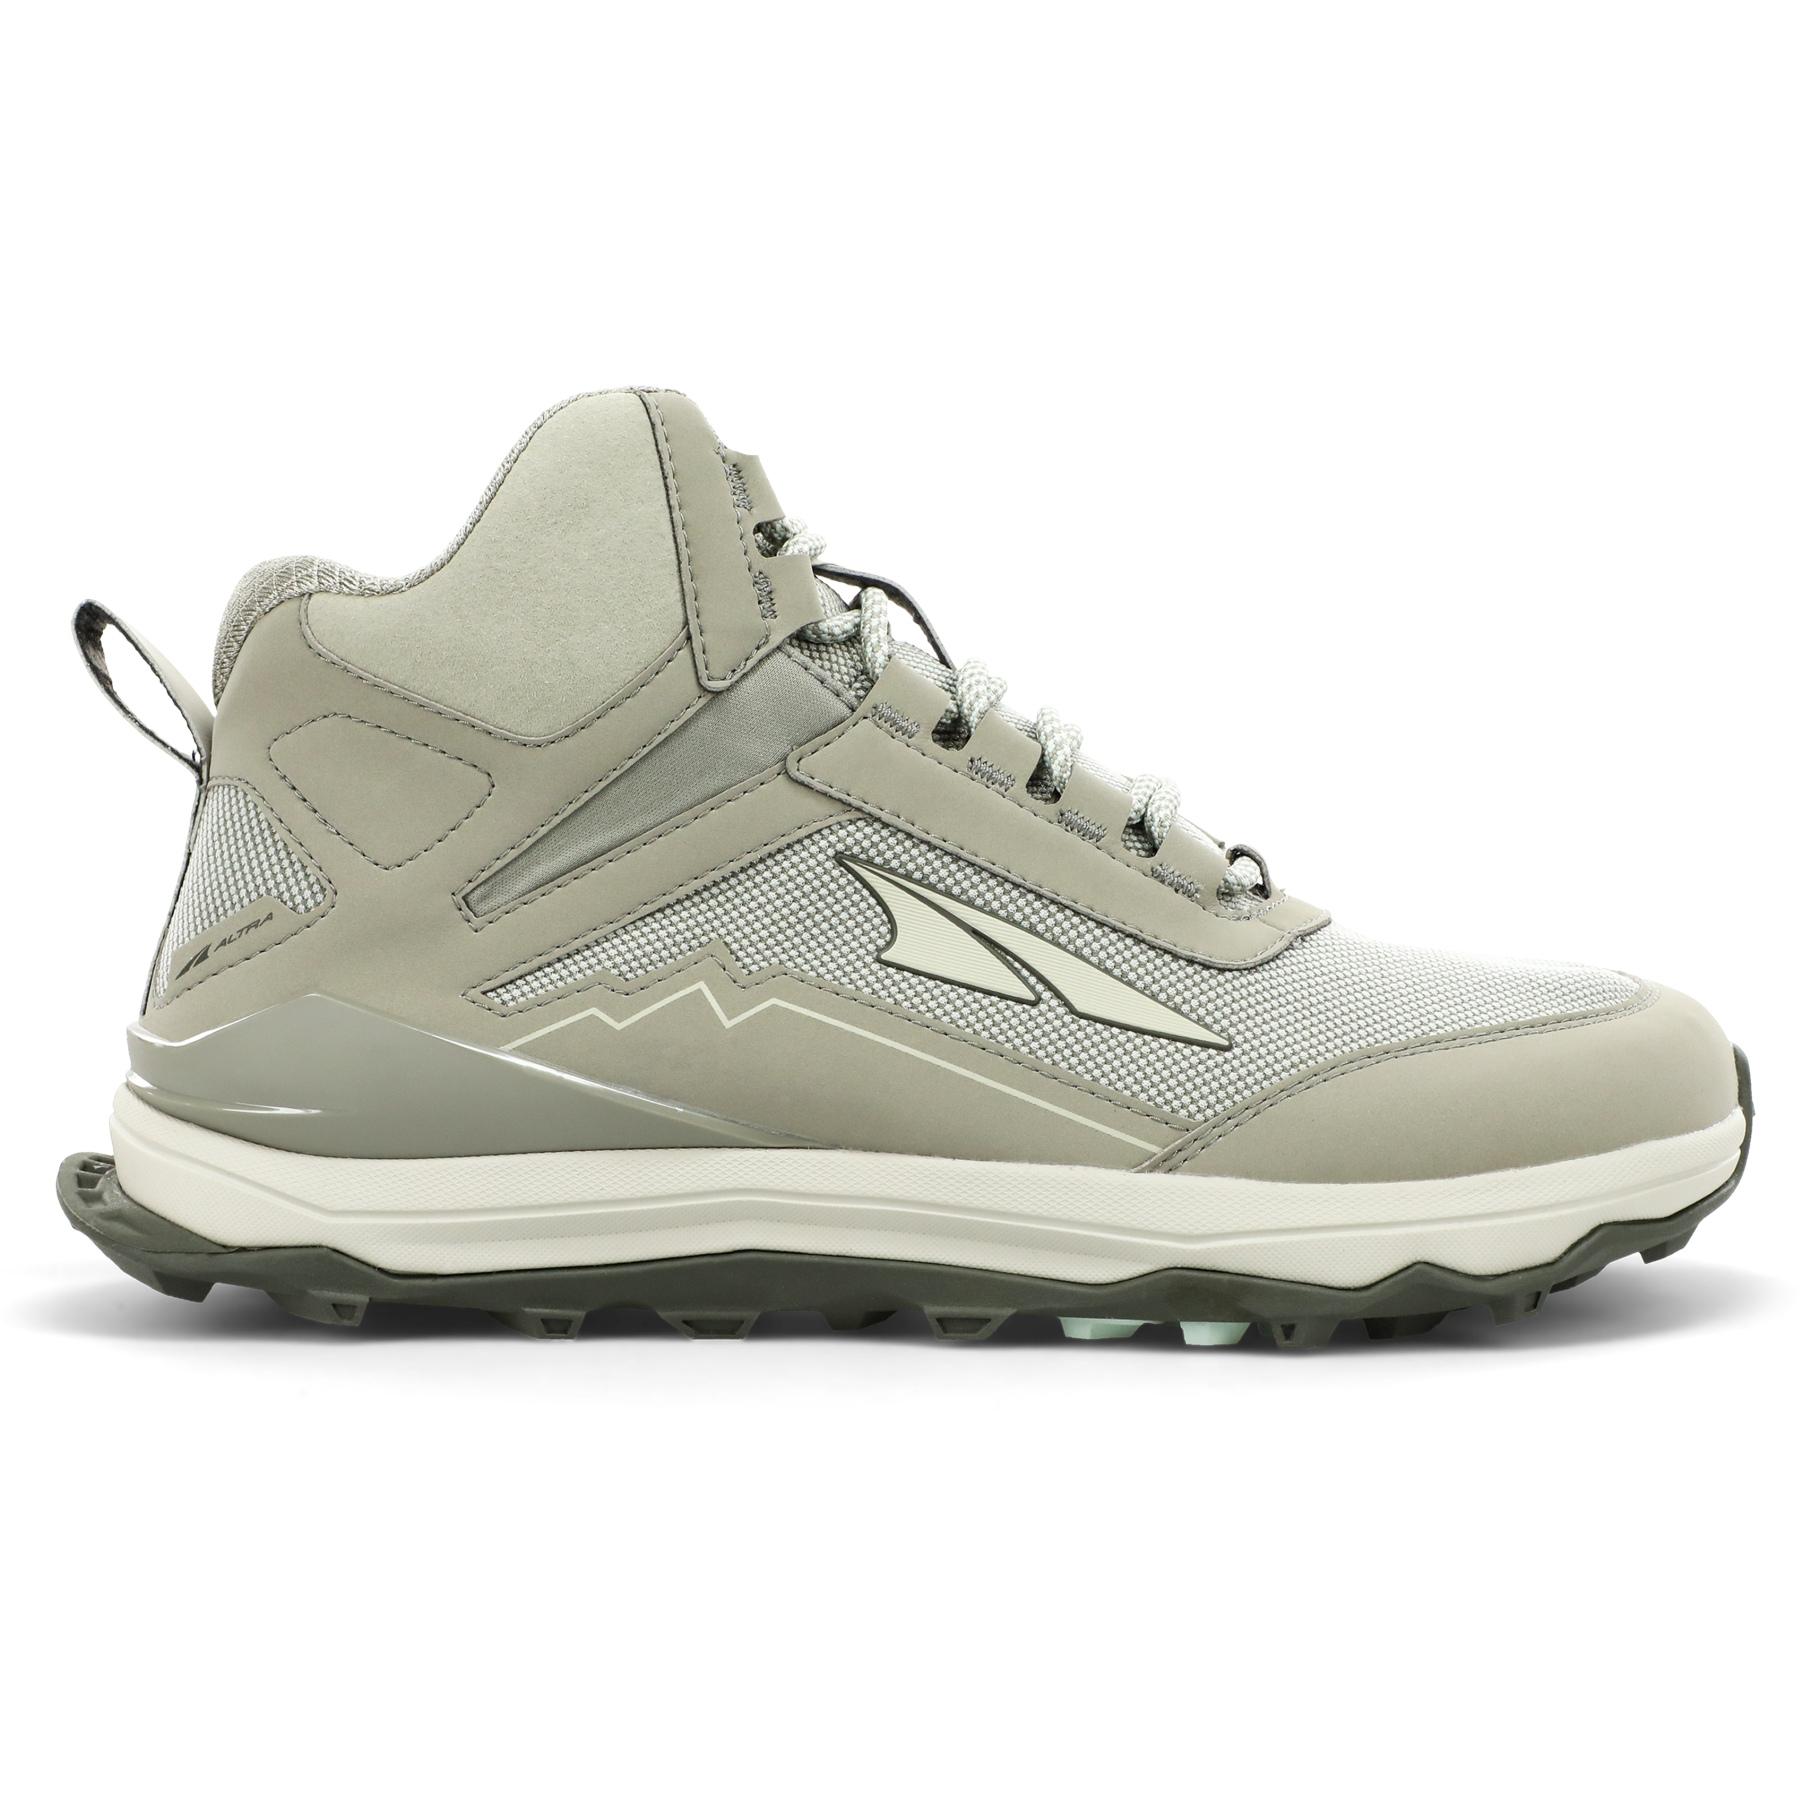 Altra Lone Peak Hiker Hiking Shoes Women - Khaki